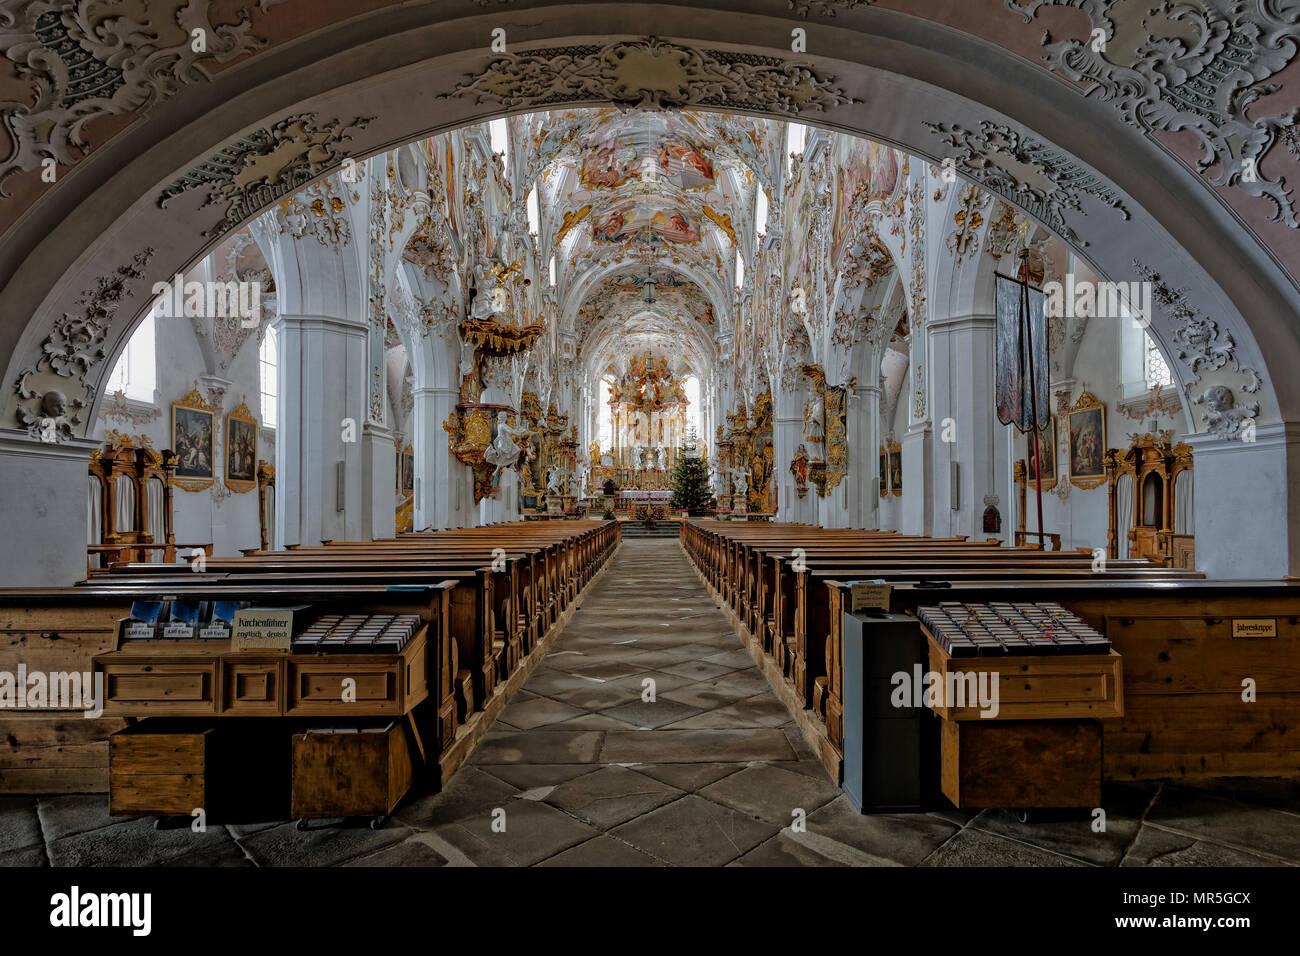 Rottenbuch - Parish Church of the Mary's birth. Rottenbuch - Pfarrkirche Mariä Geburt. Stock Photo